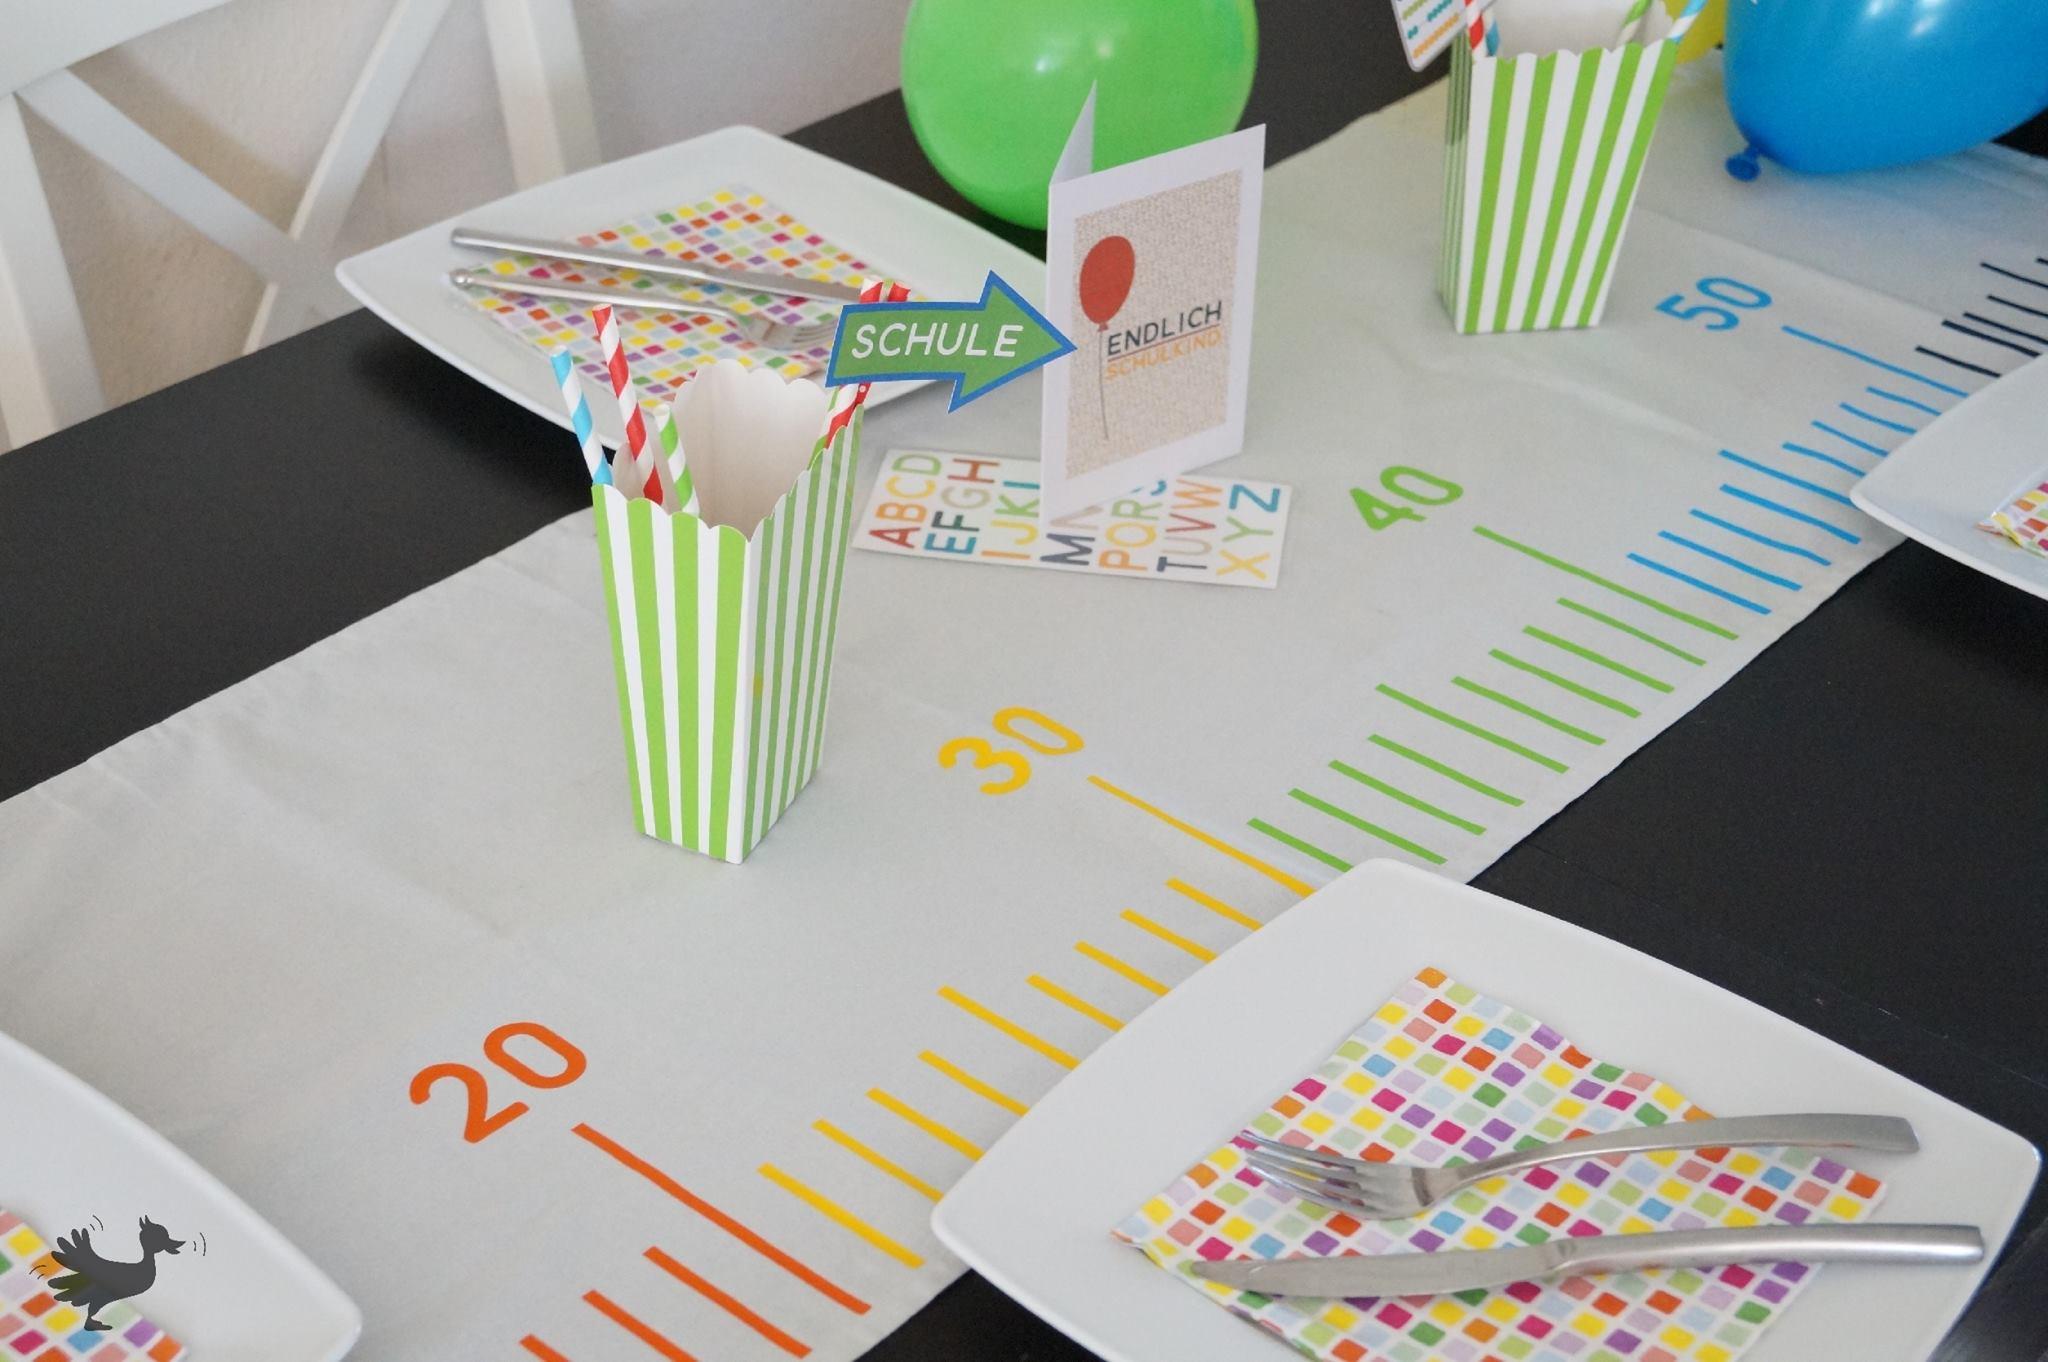 Plotterdatei spr che schule kleine g hr e design for Designer schule